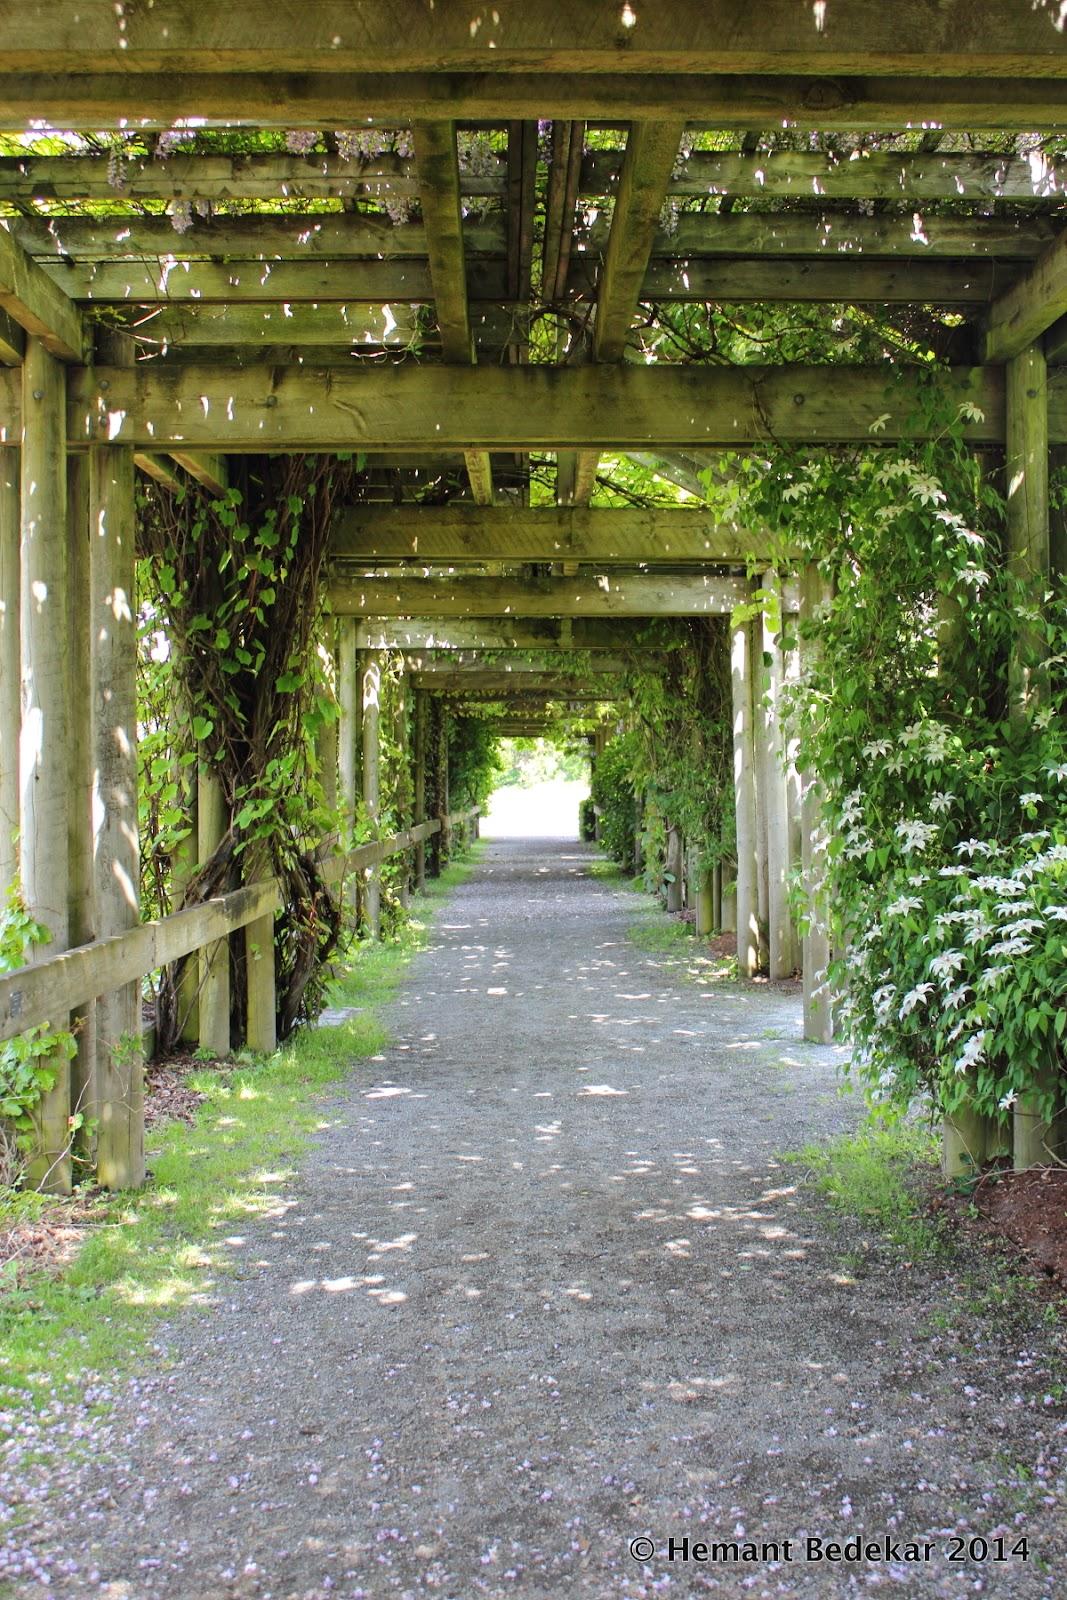 University of British Columbia - Botanical Garden